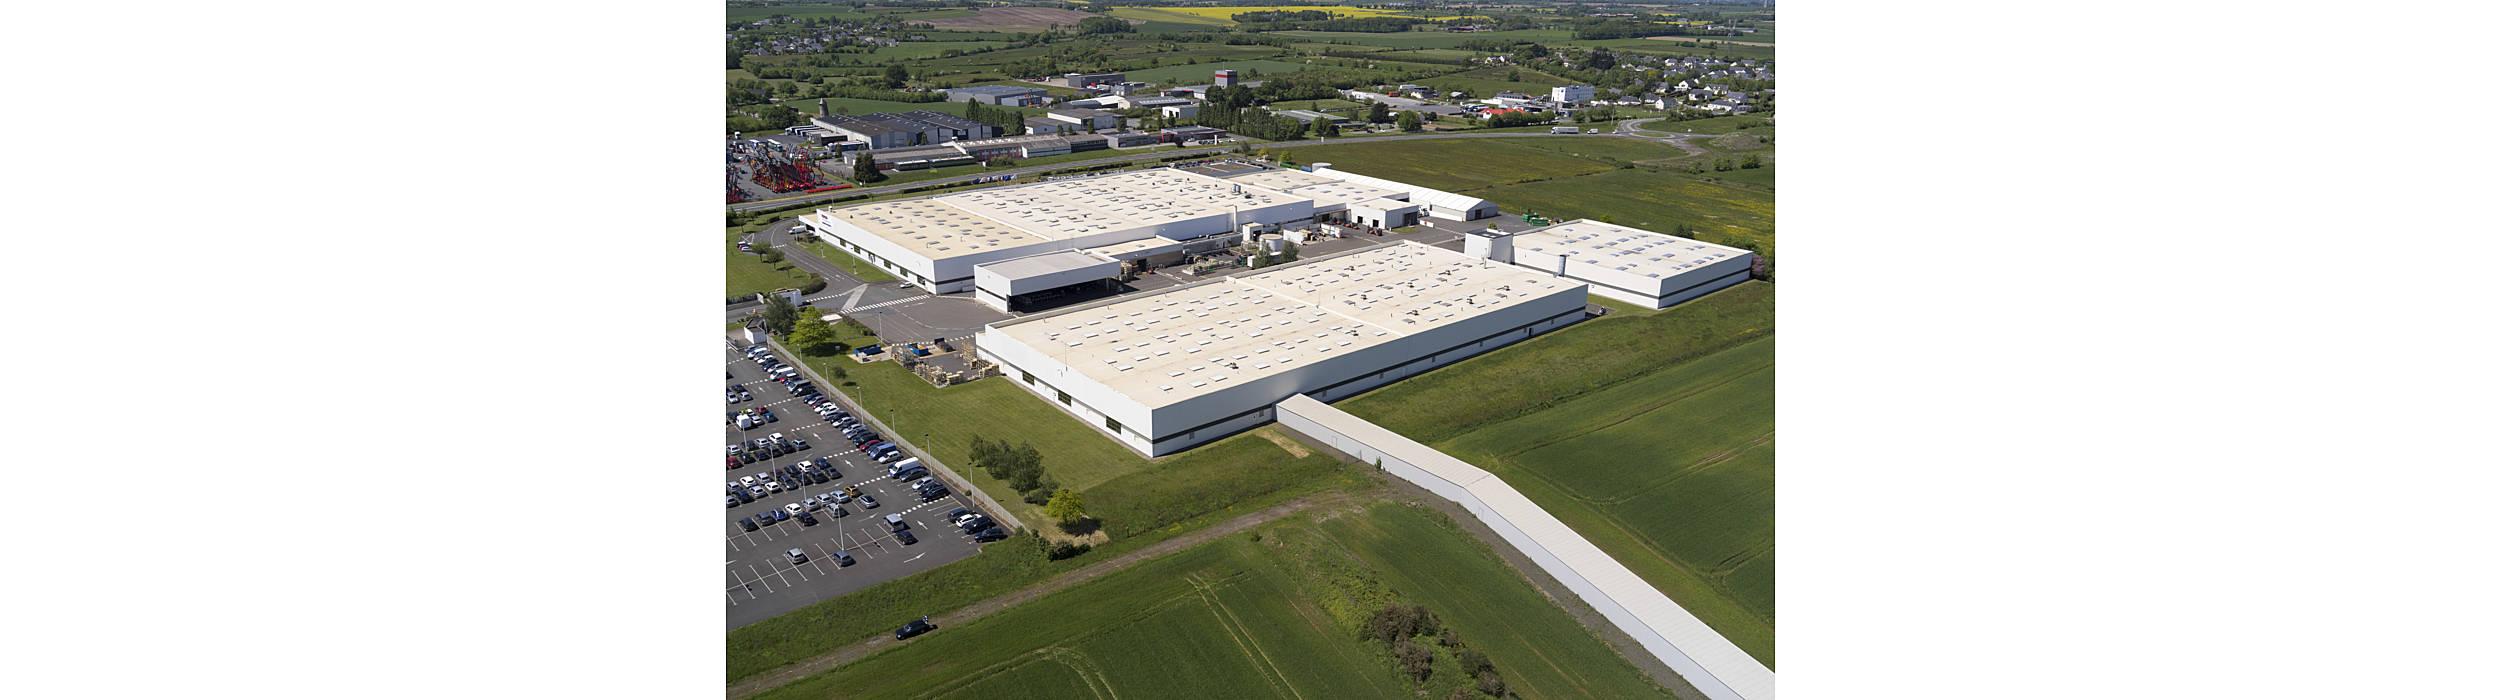 oficinas toyota industries corporation